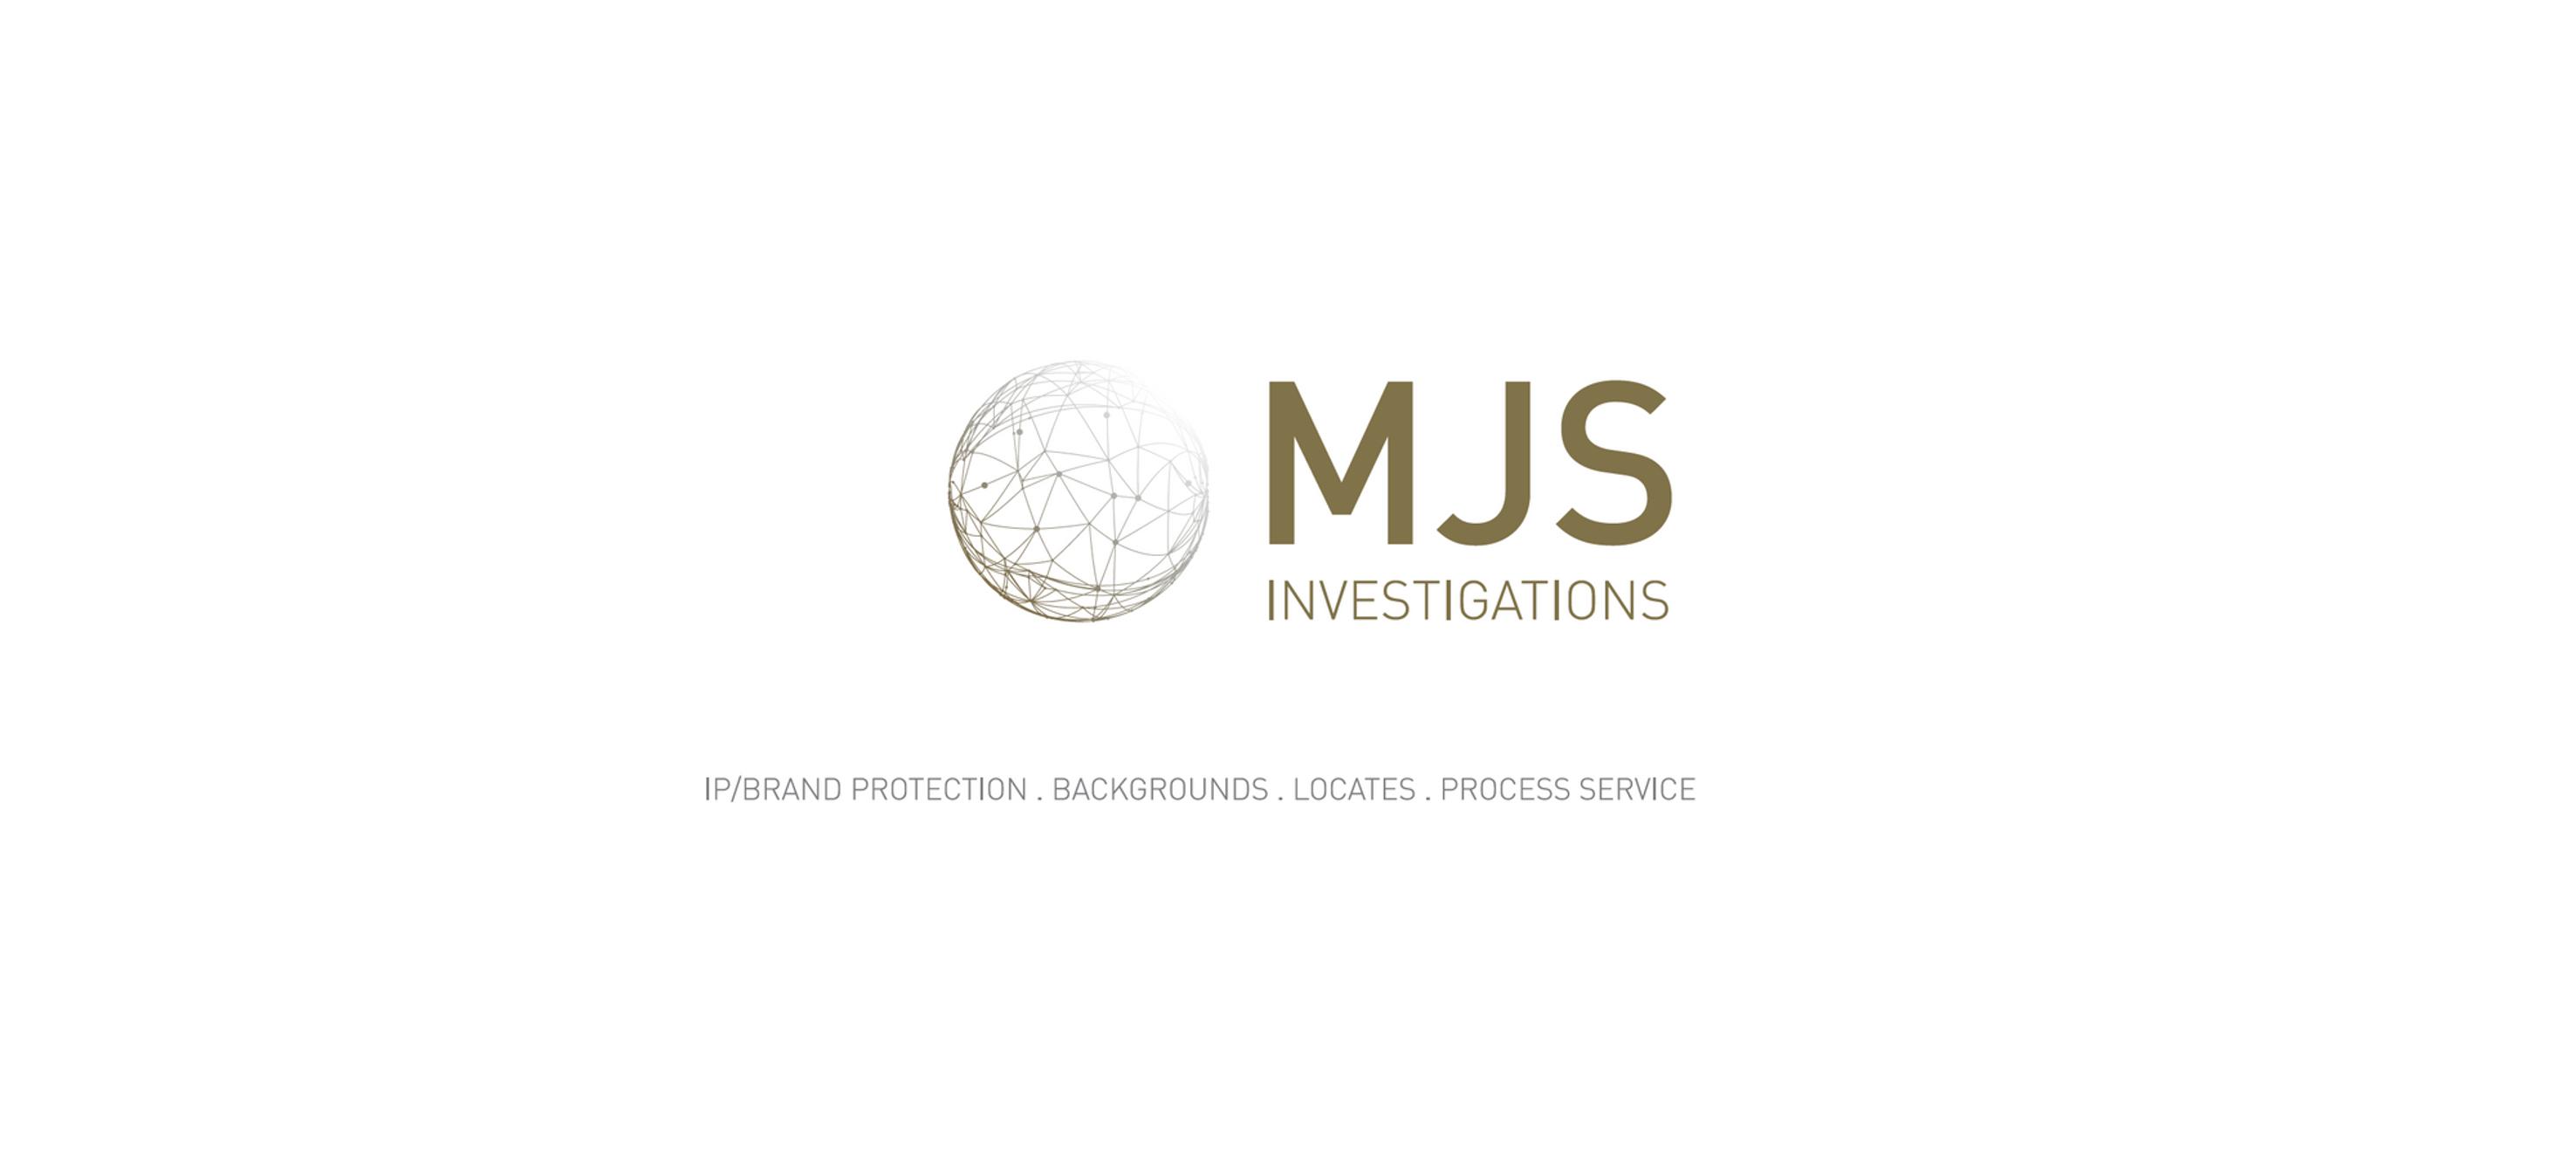 MJS Investigations |Trademark|Background|Locates|Process Service